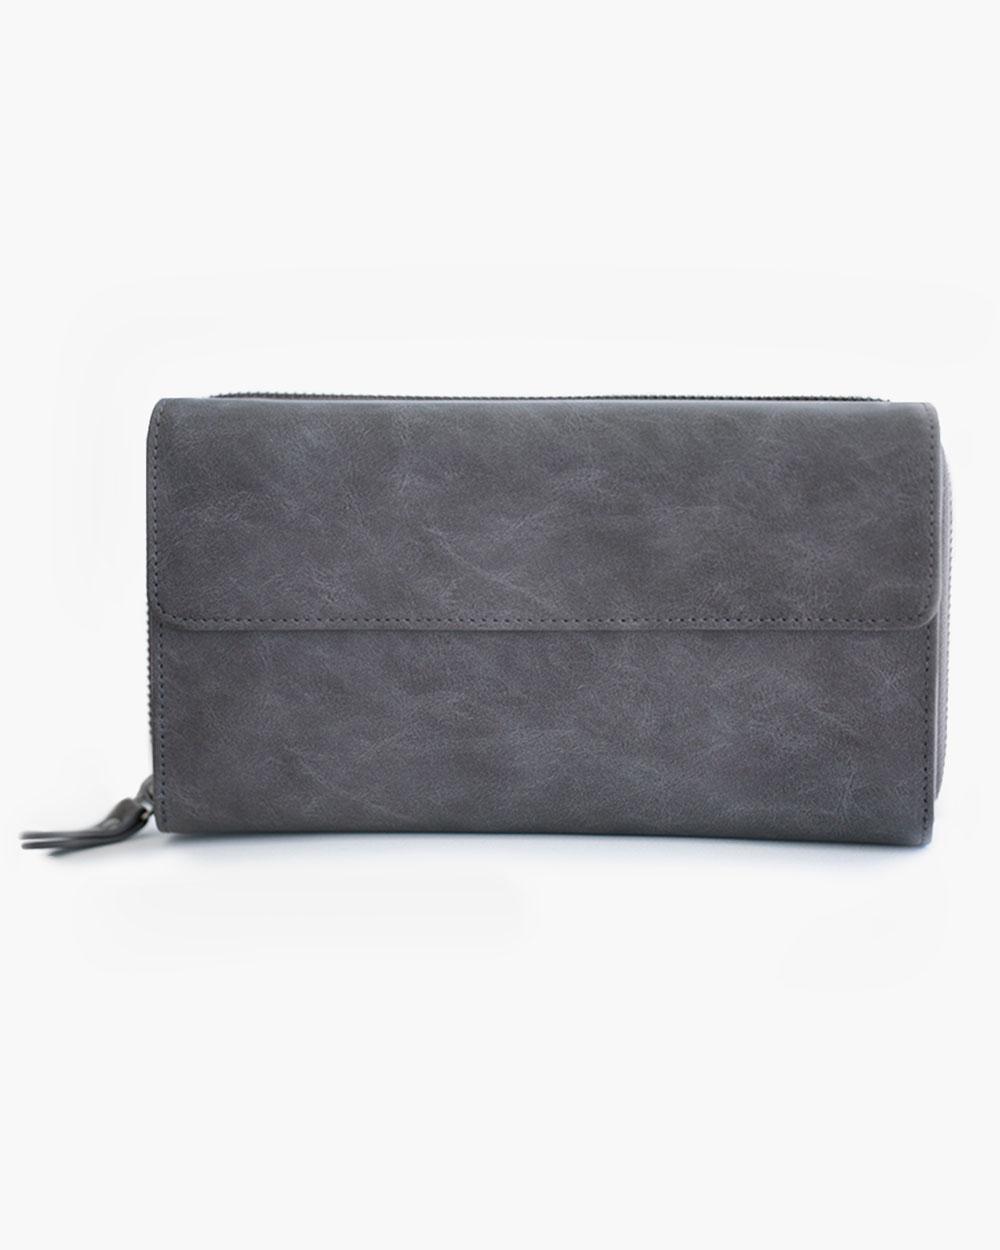 Clutch Wallet - Charcoal